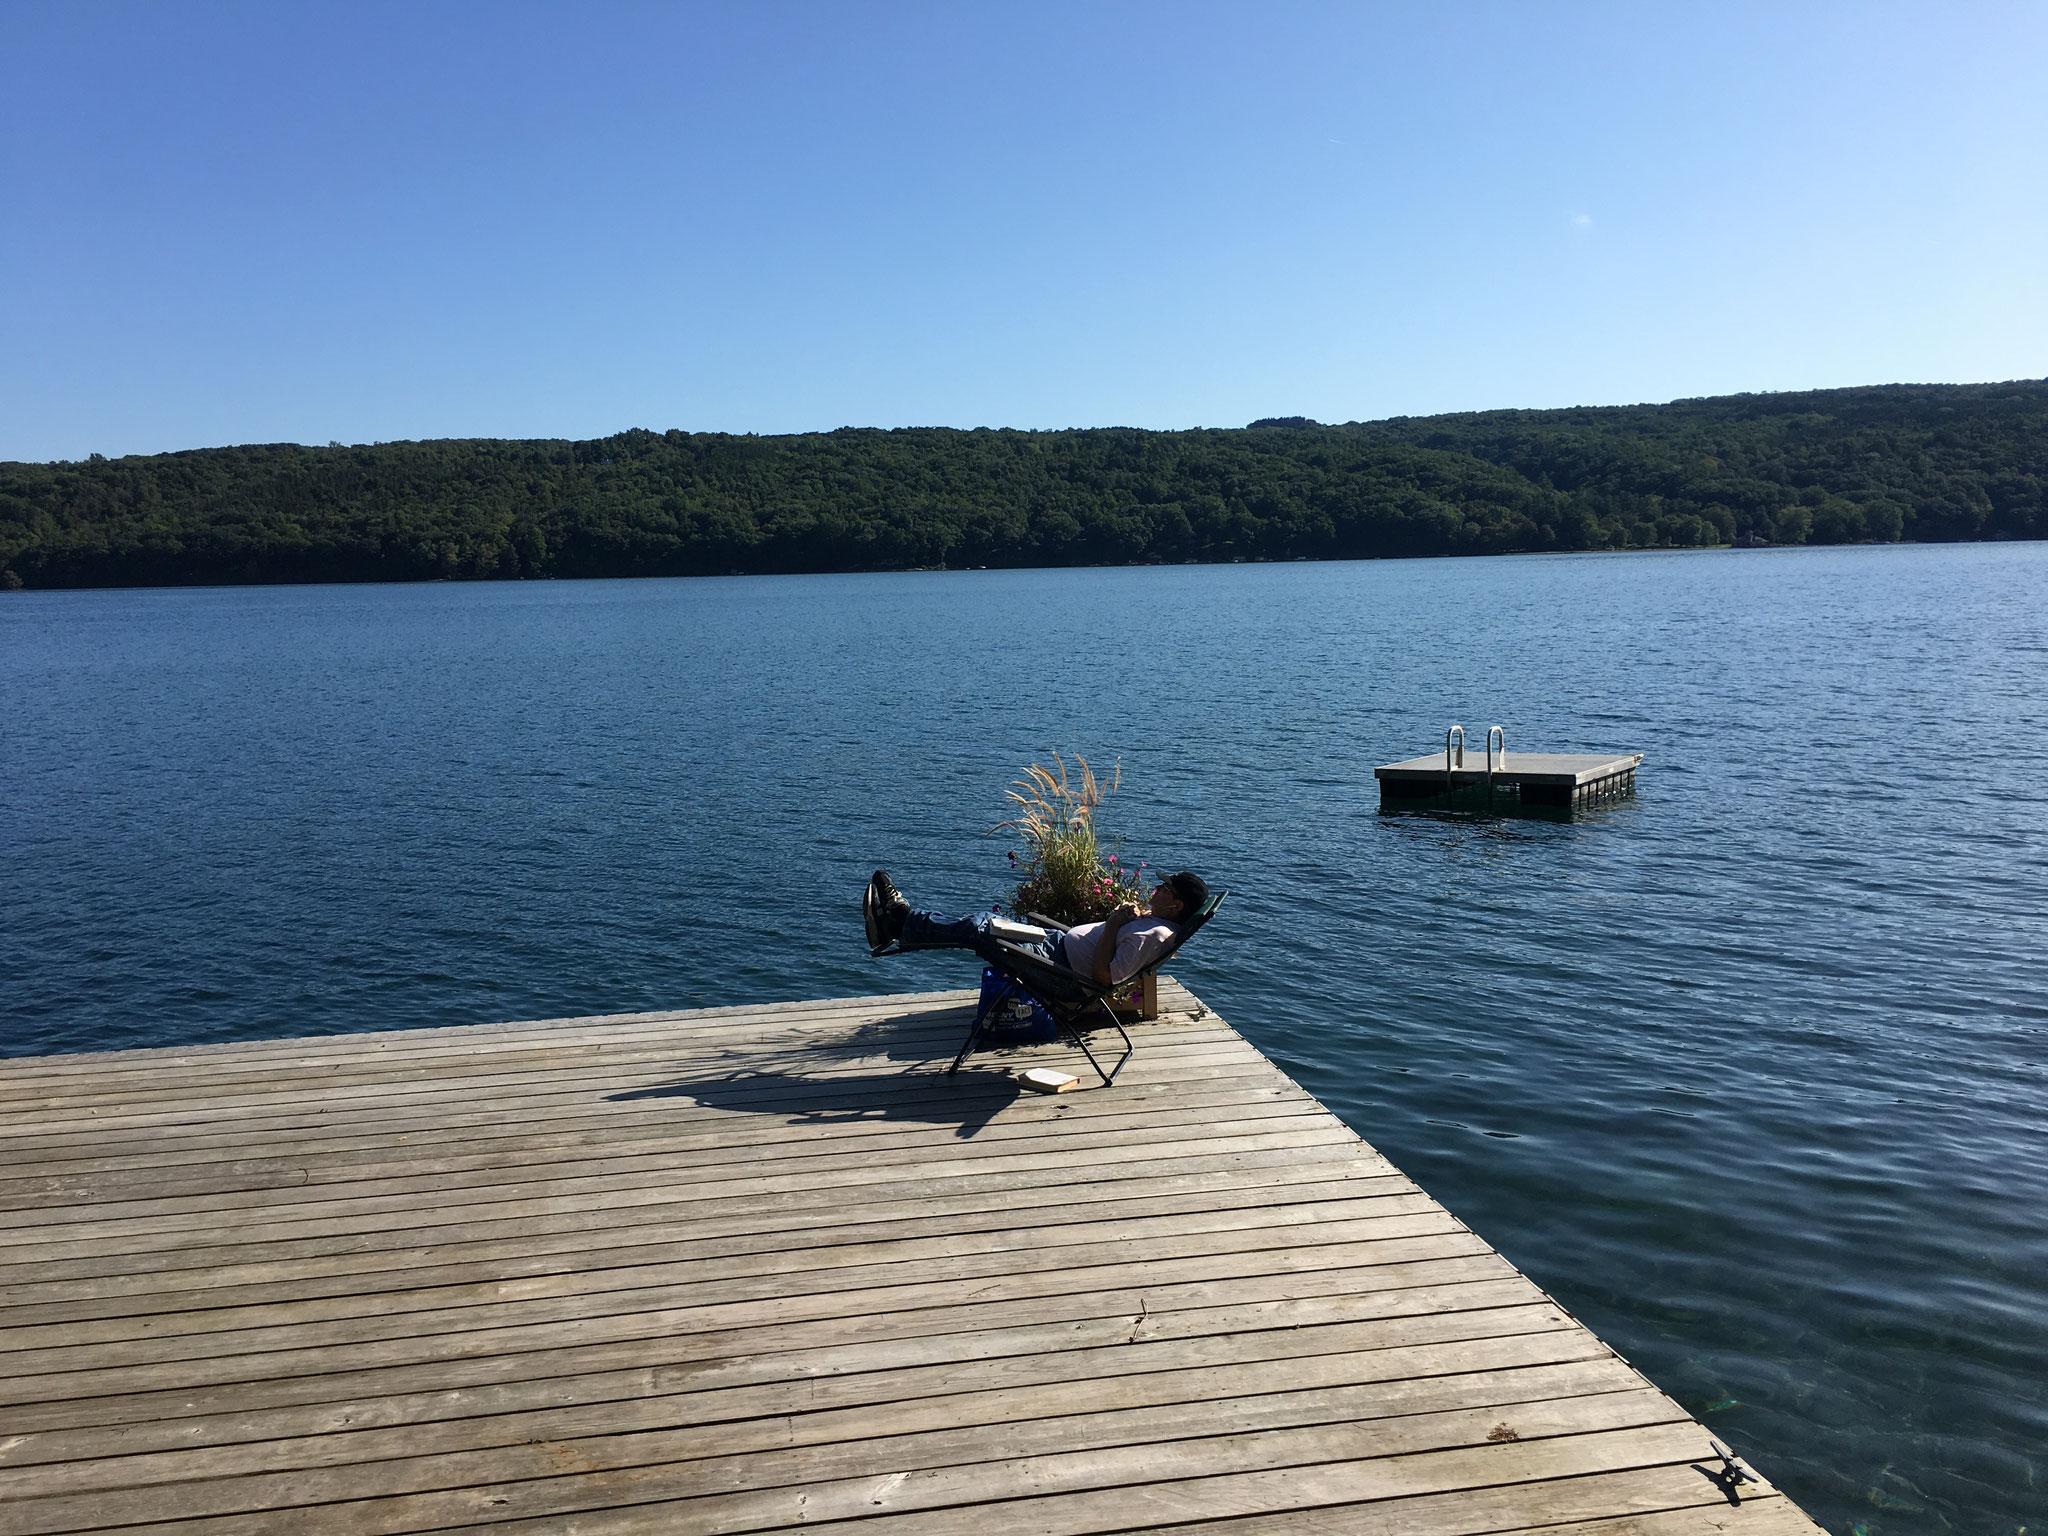 John on a sunny day, Skaneateles Lake